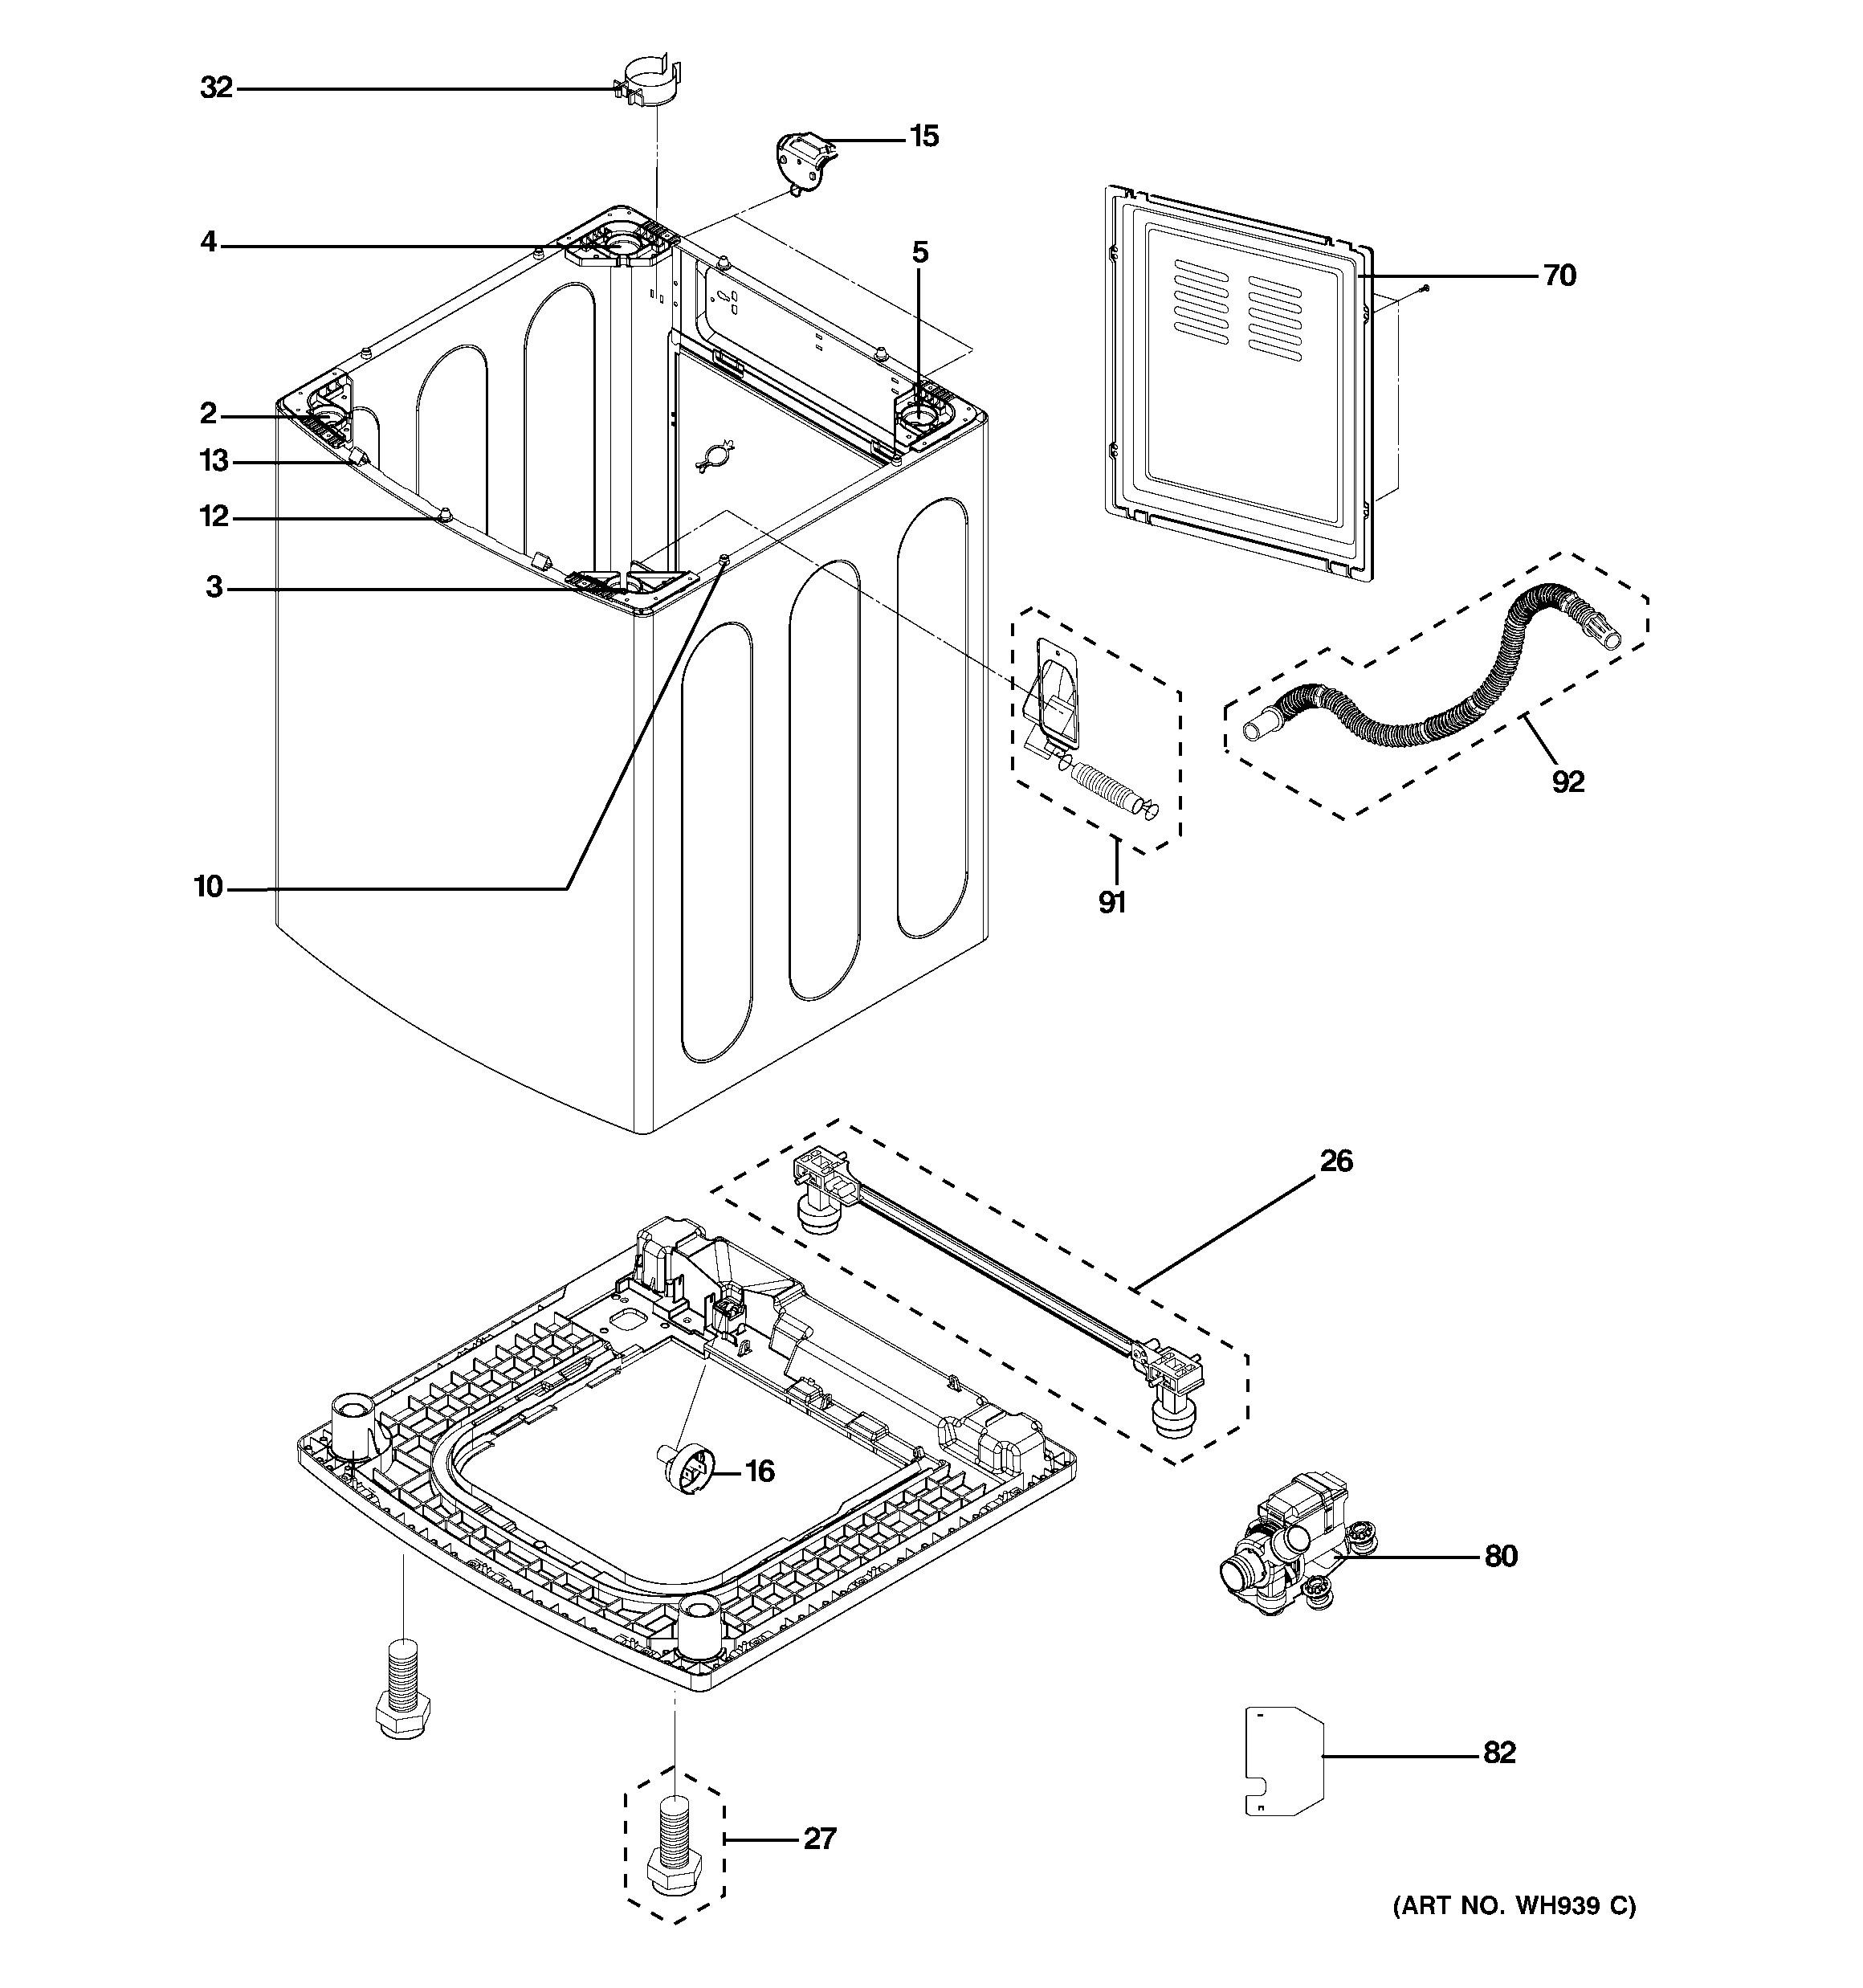 Ge Quiet Power 3 Parts Diagram Ge Washer Parts Model